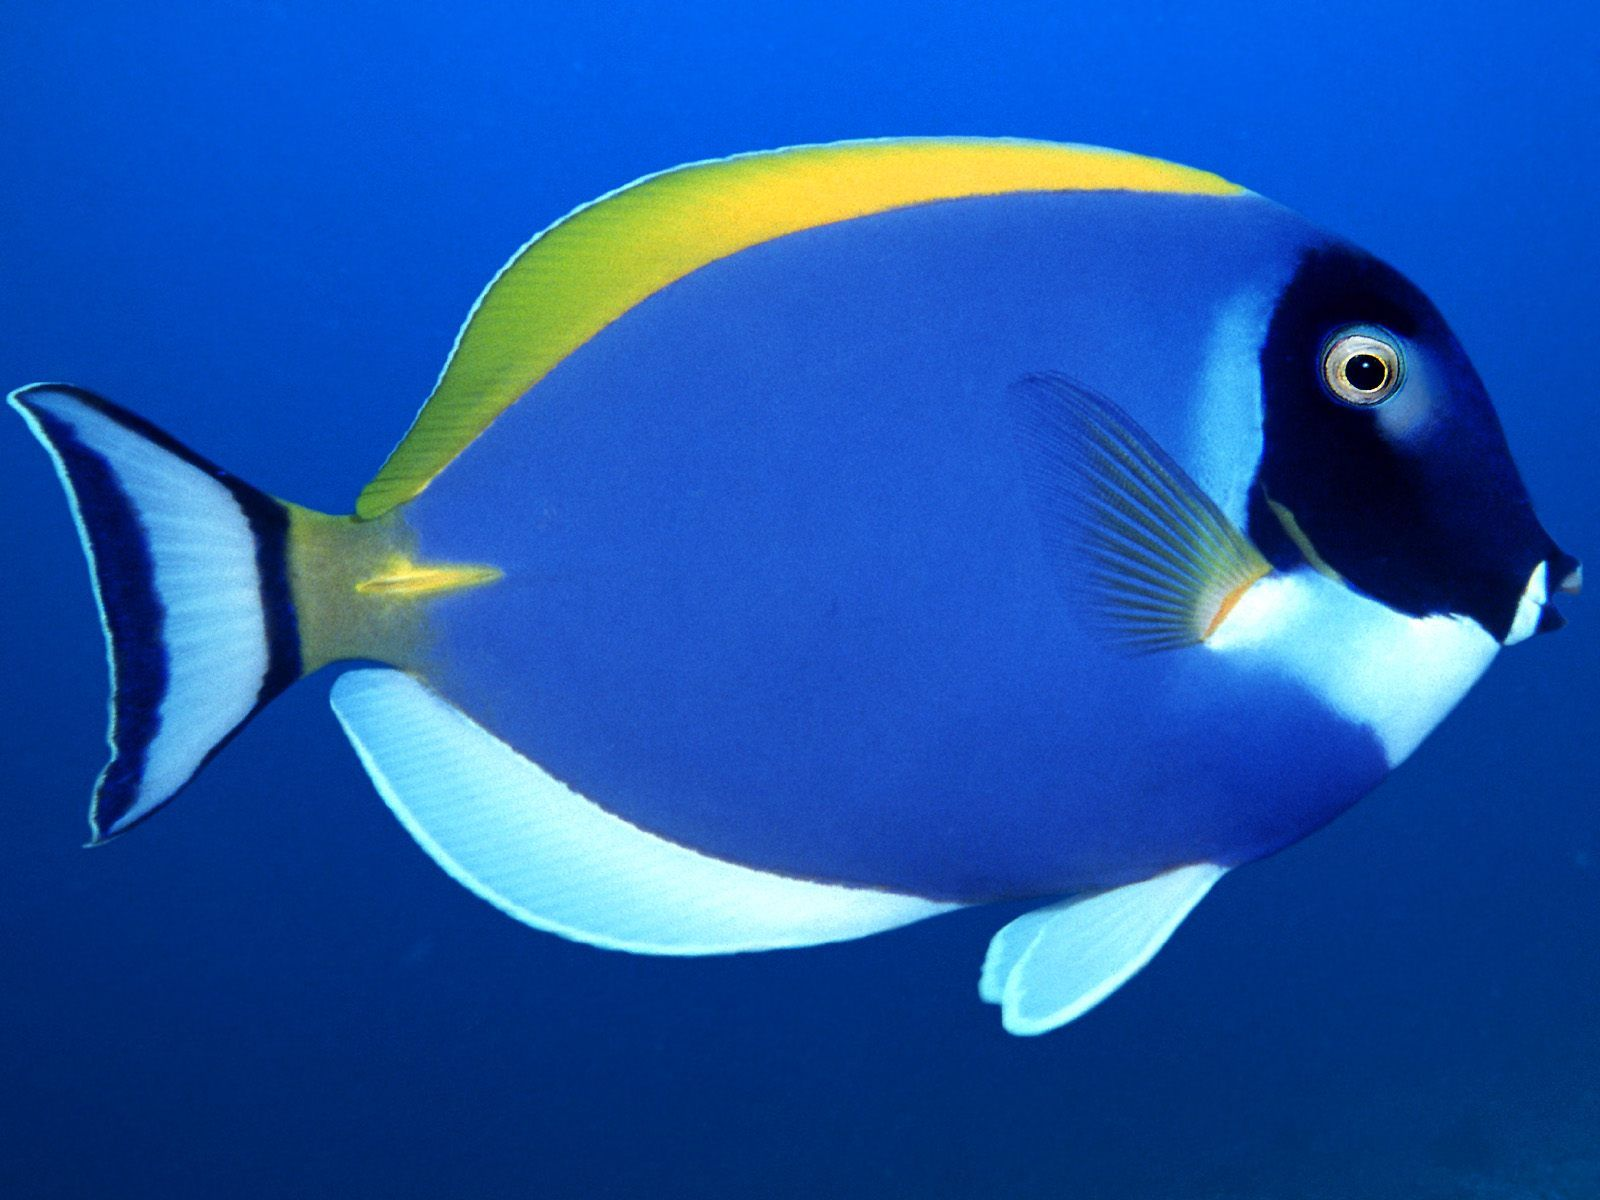 Poissons Tropicaux Powder Blue Surgeon Beautiful Fish Tropical Fish Sea Fish